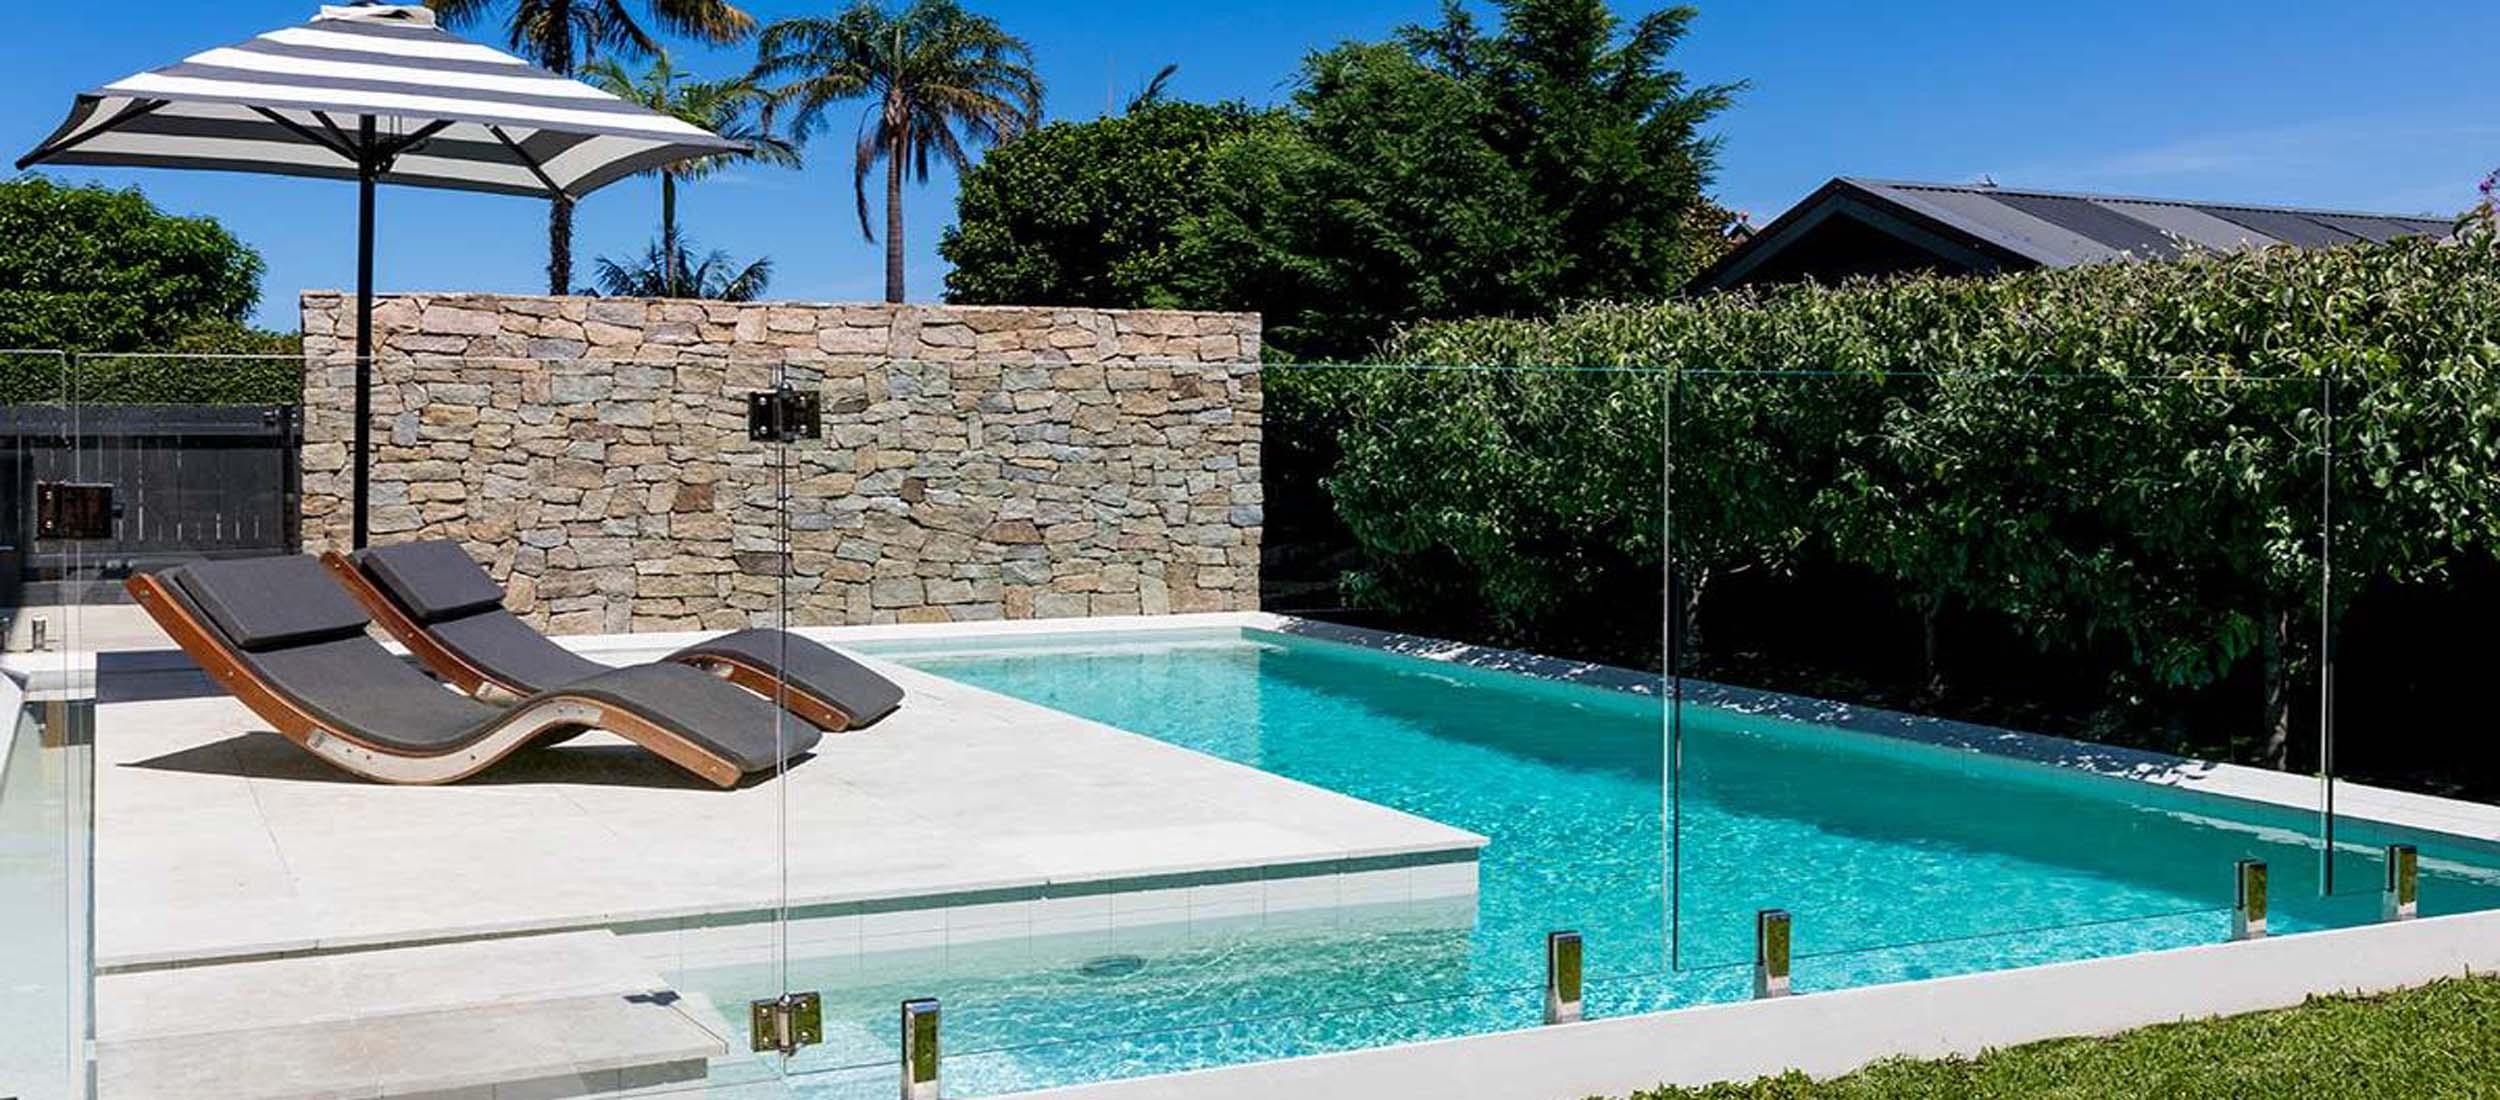 himalayan sandstone pool